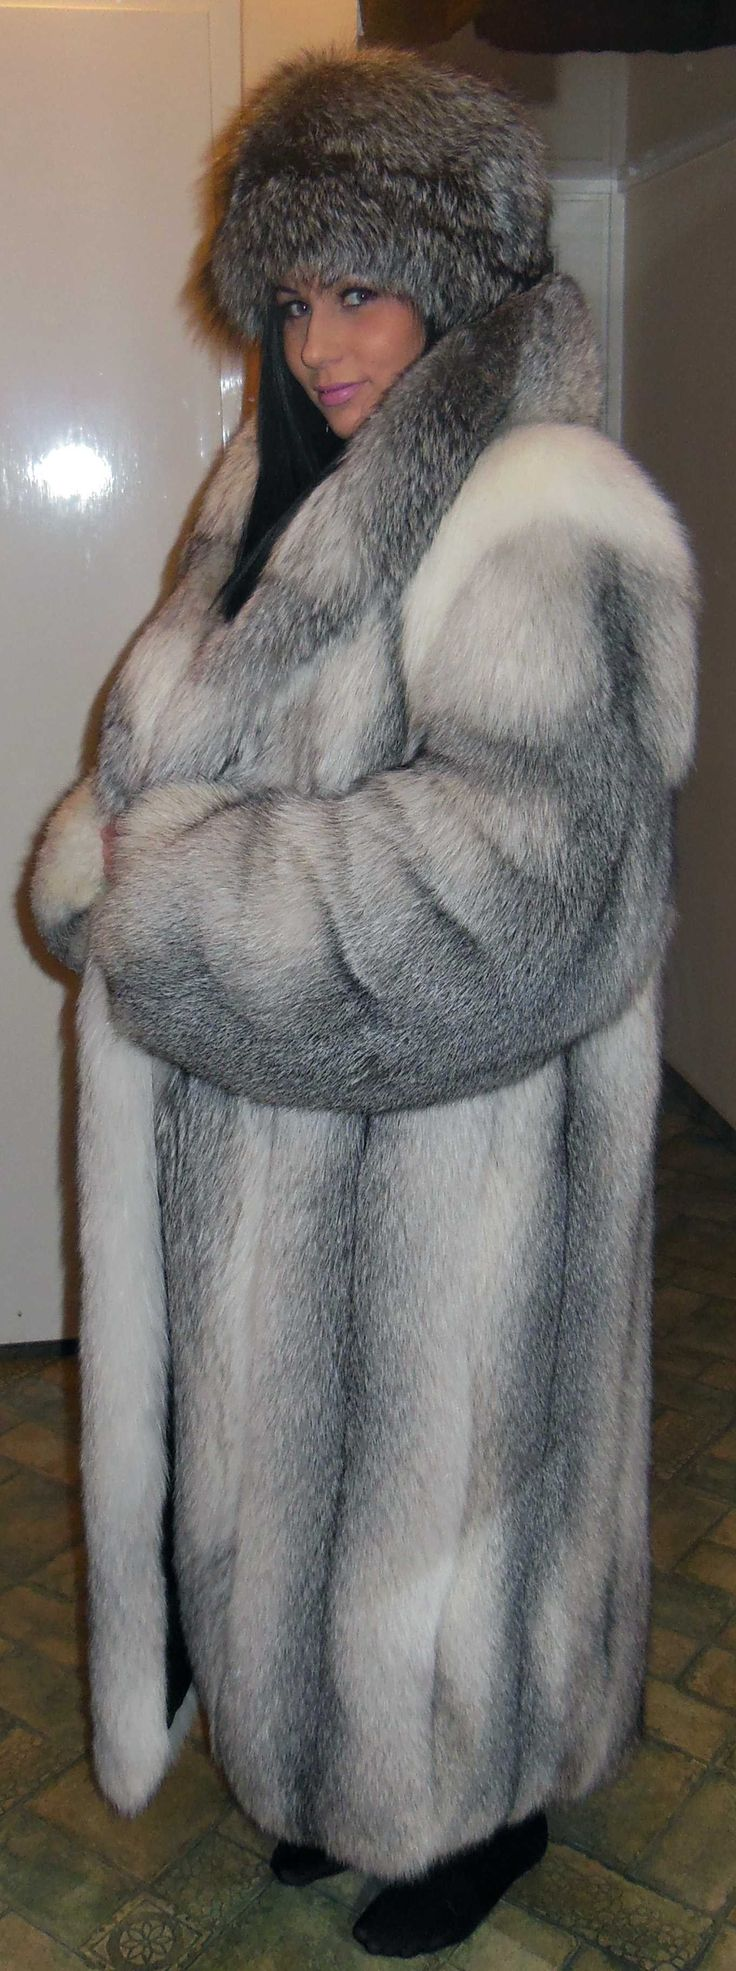 Heck fur coat fetish pics she?